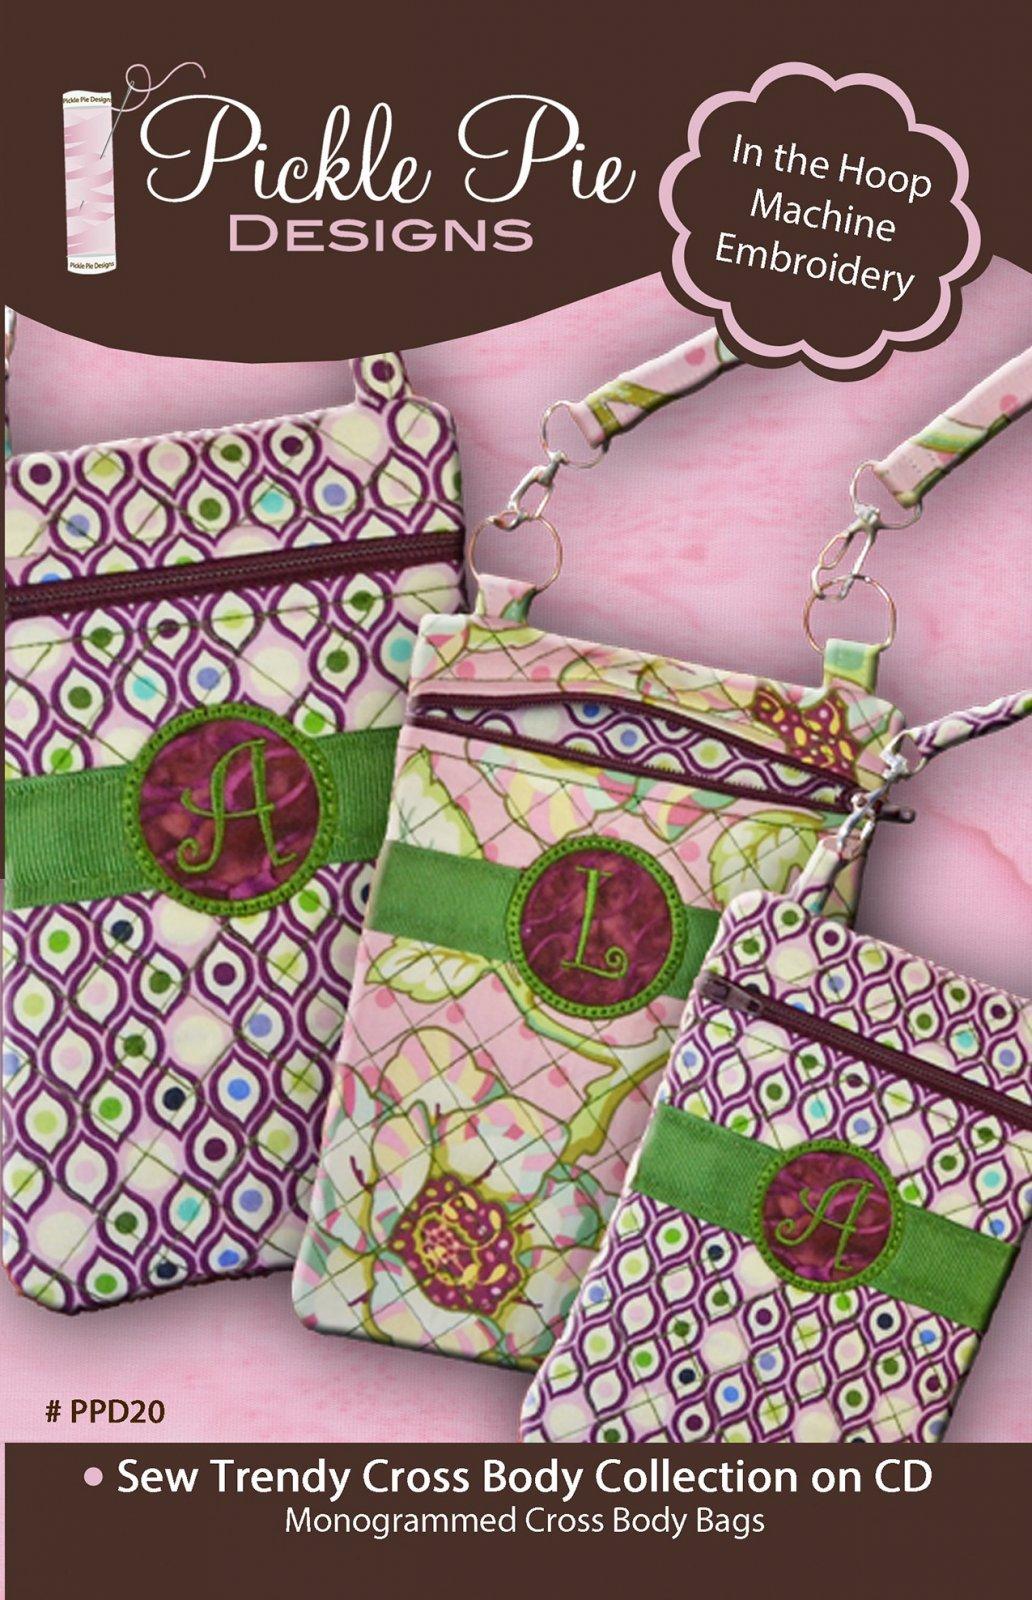 CD Sew Trendy Cross Body Bags In the Hoop Machine Embroidery